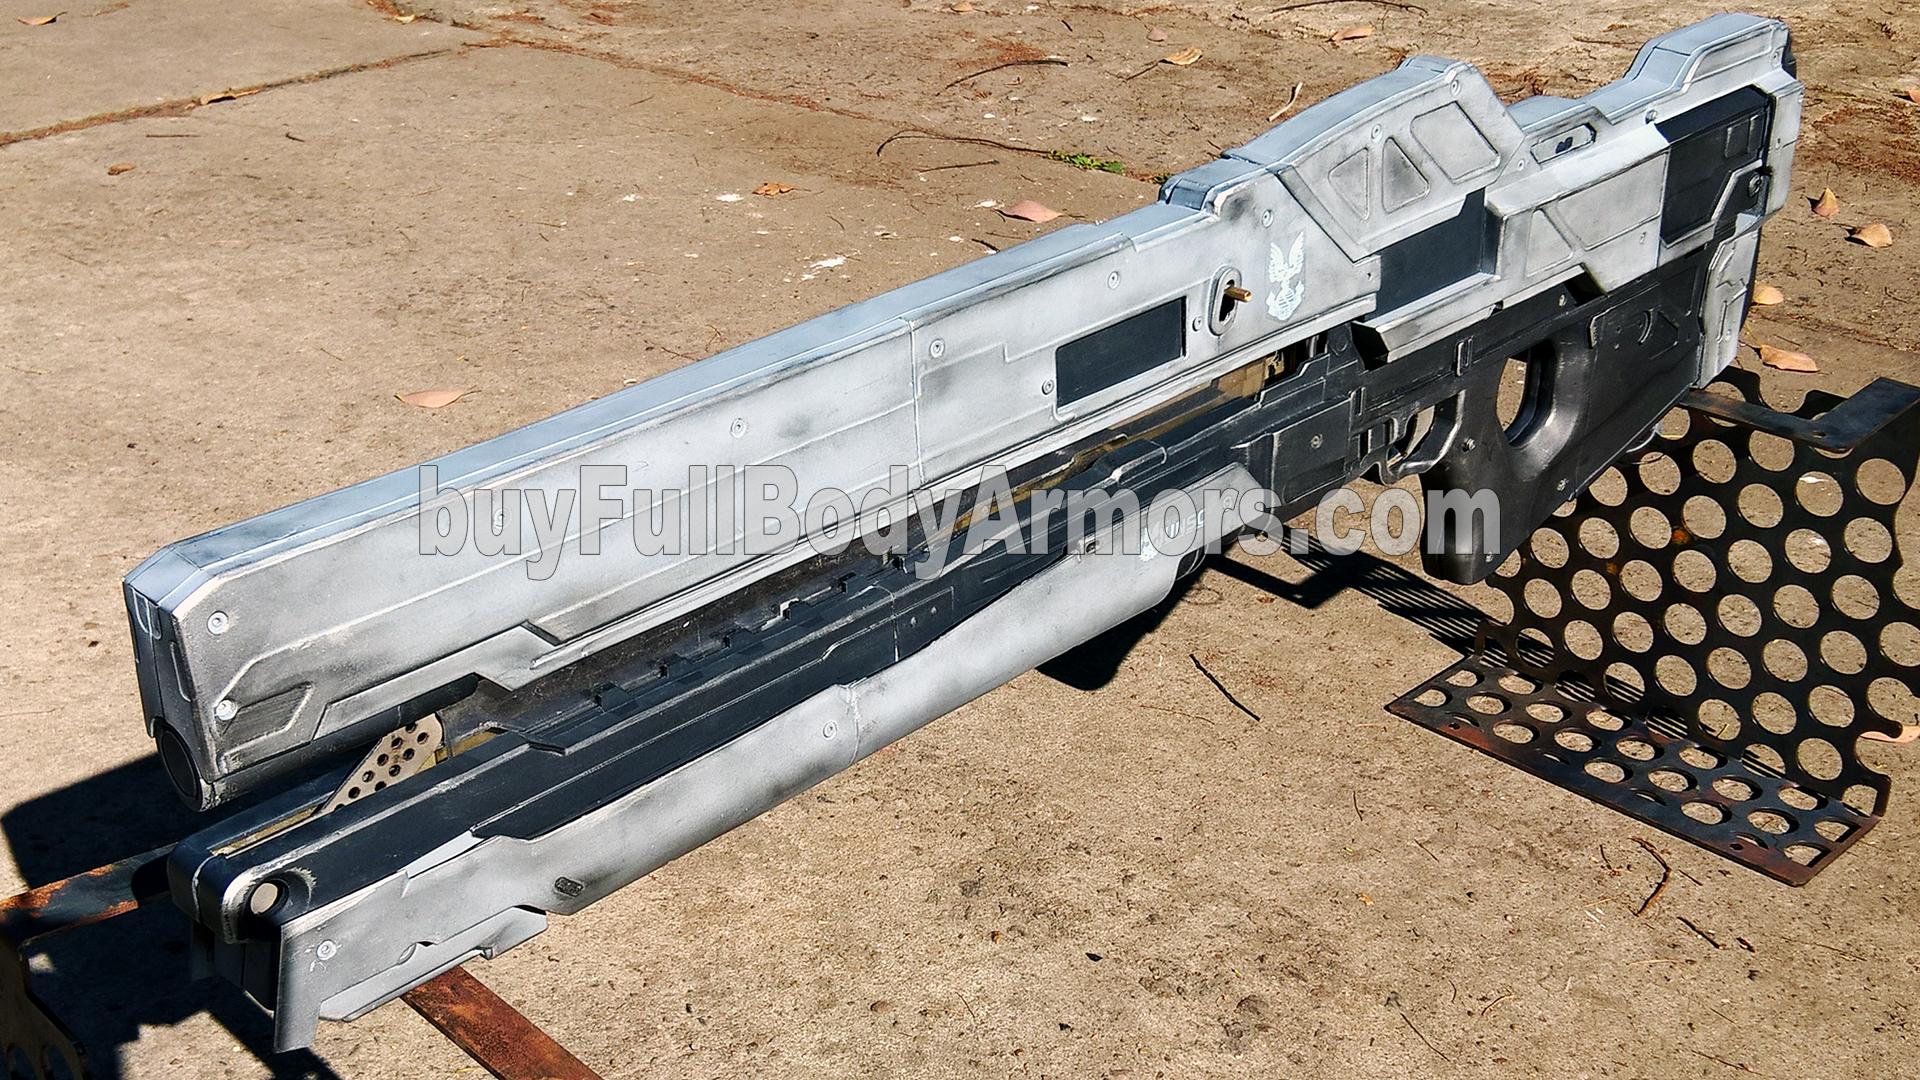 [Weathered Effect] Halo Wars 2 ARC920 RailGun (Rail Gun) 2